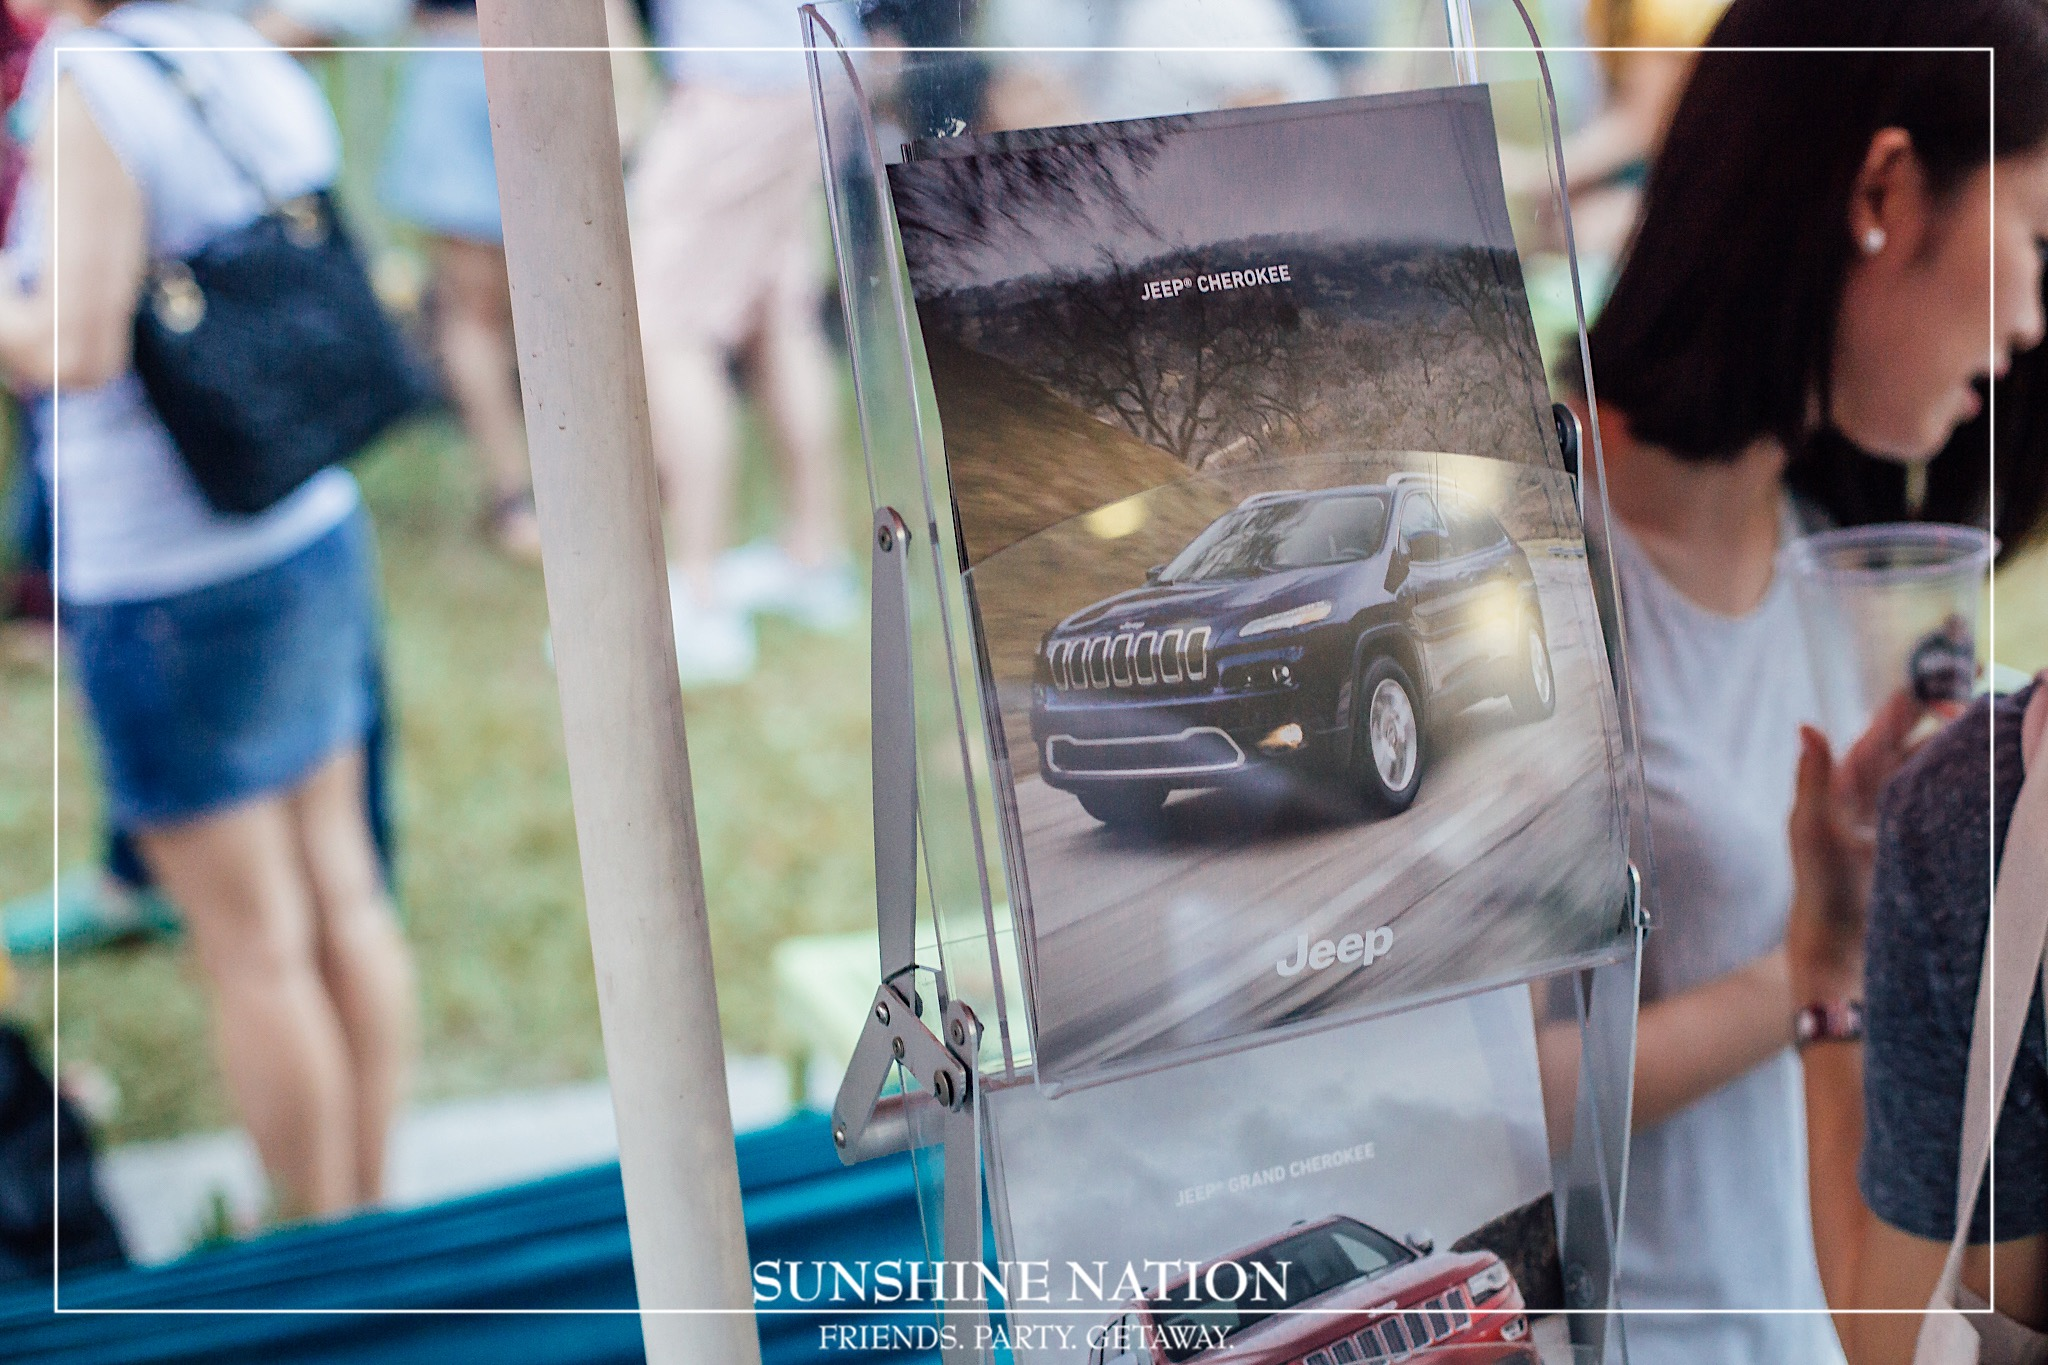 20112016_SunshineNation_Colossal140_Watermarked.jpg